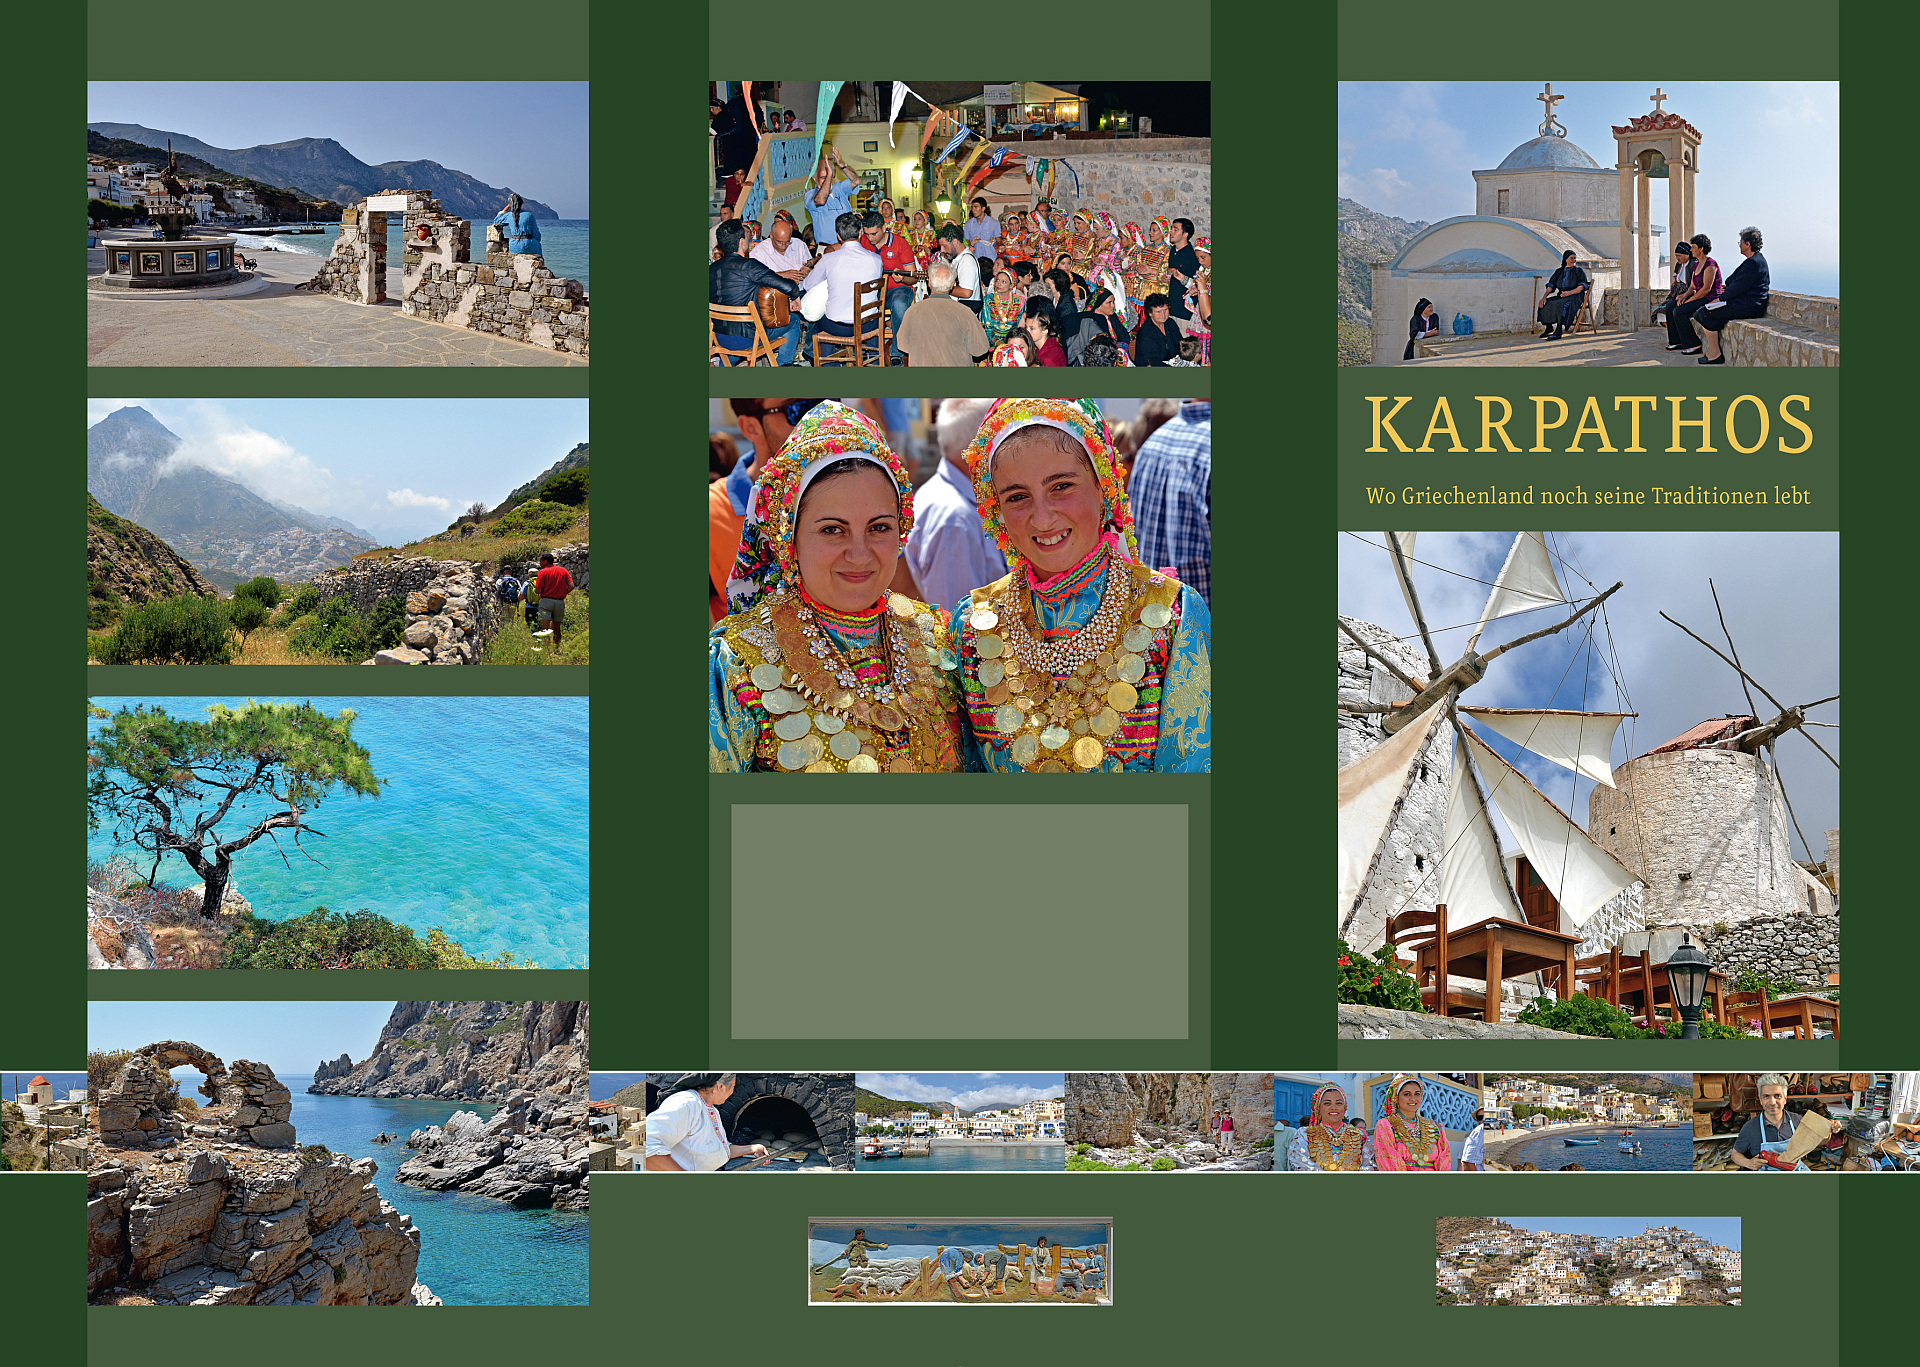 Flyer_Karpathos_12-2014_Gruen2.indd